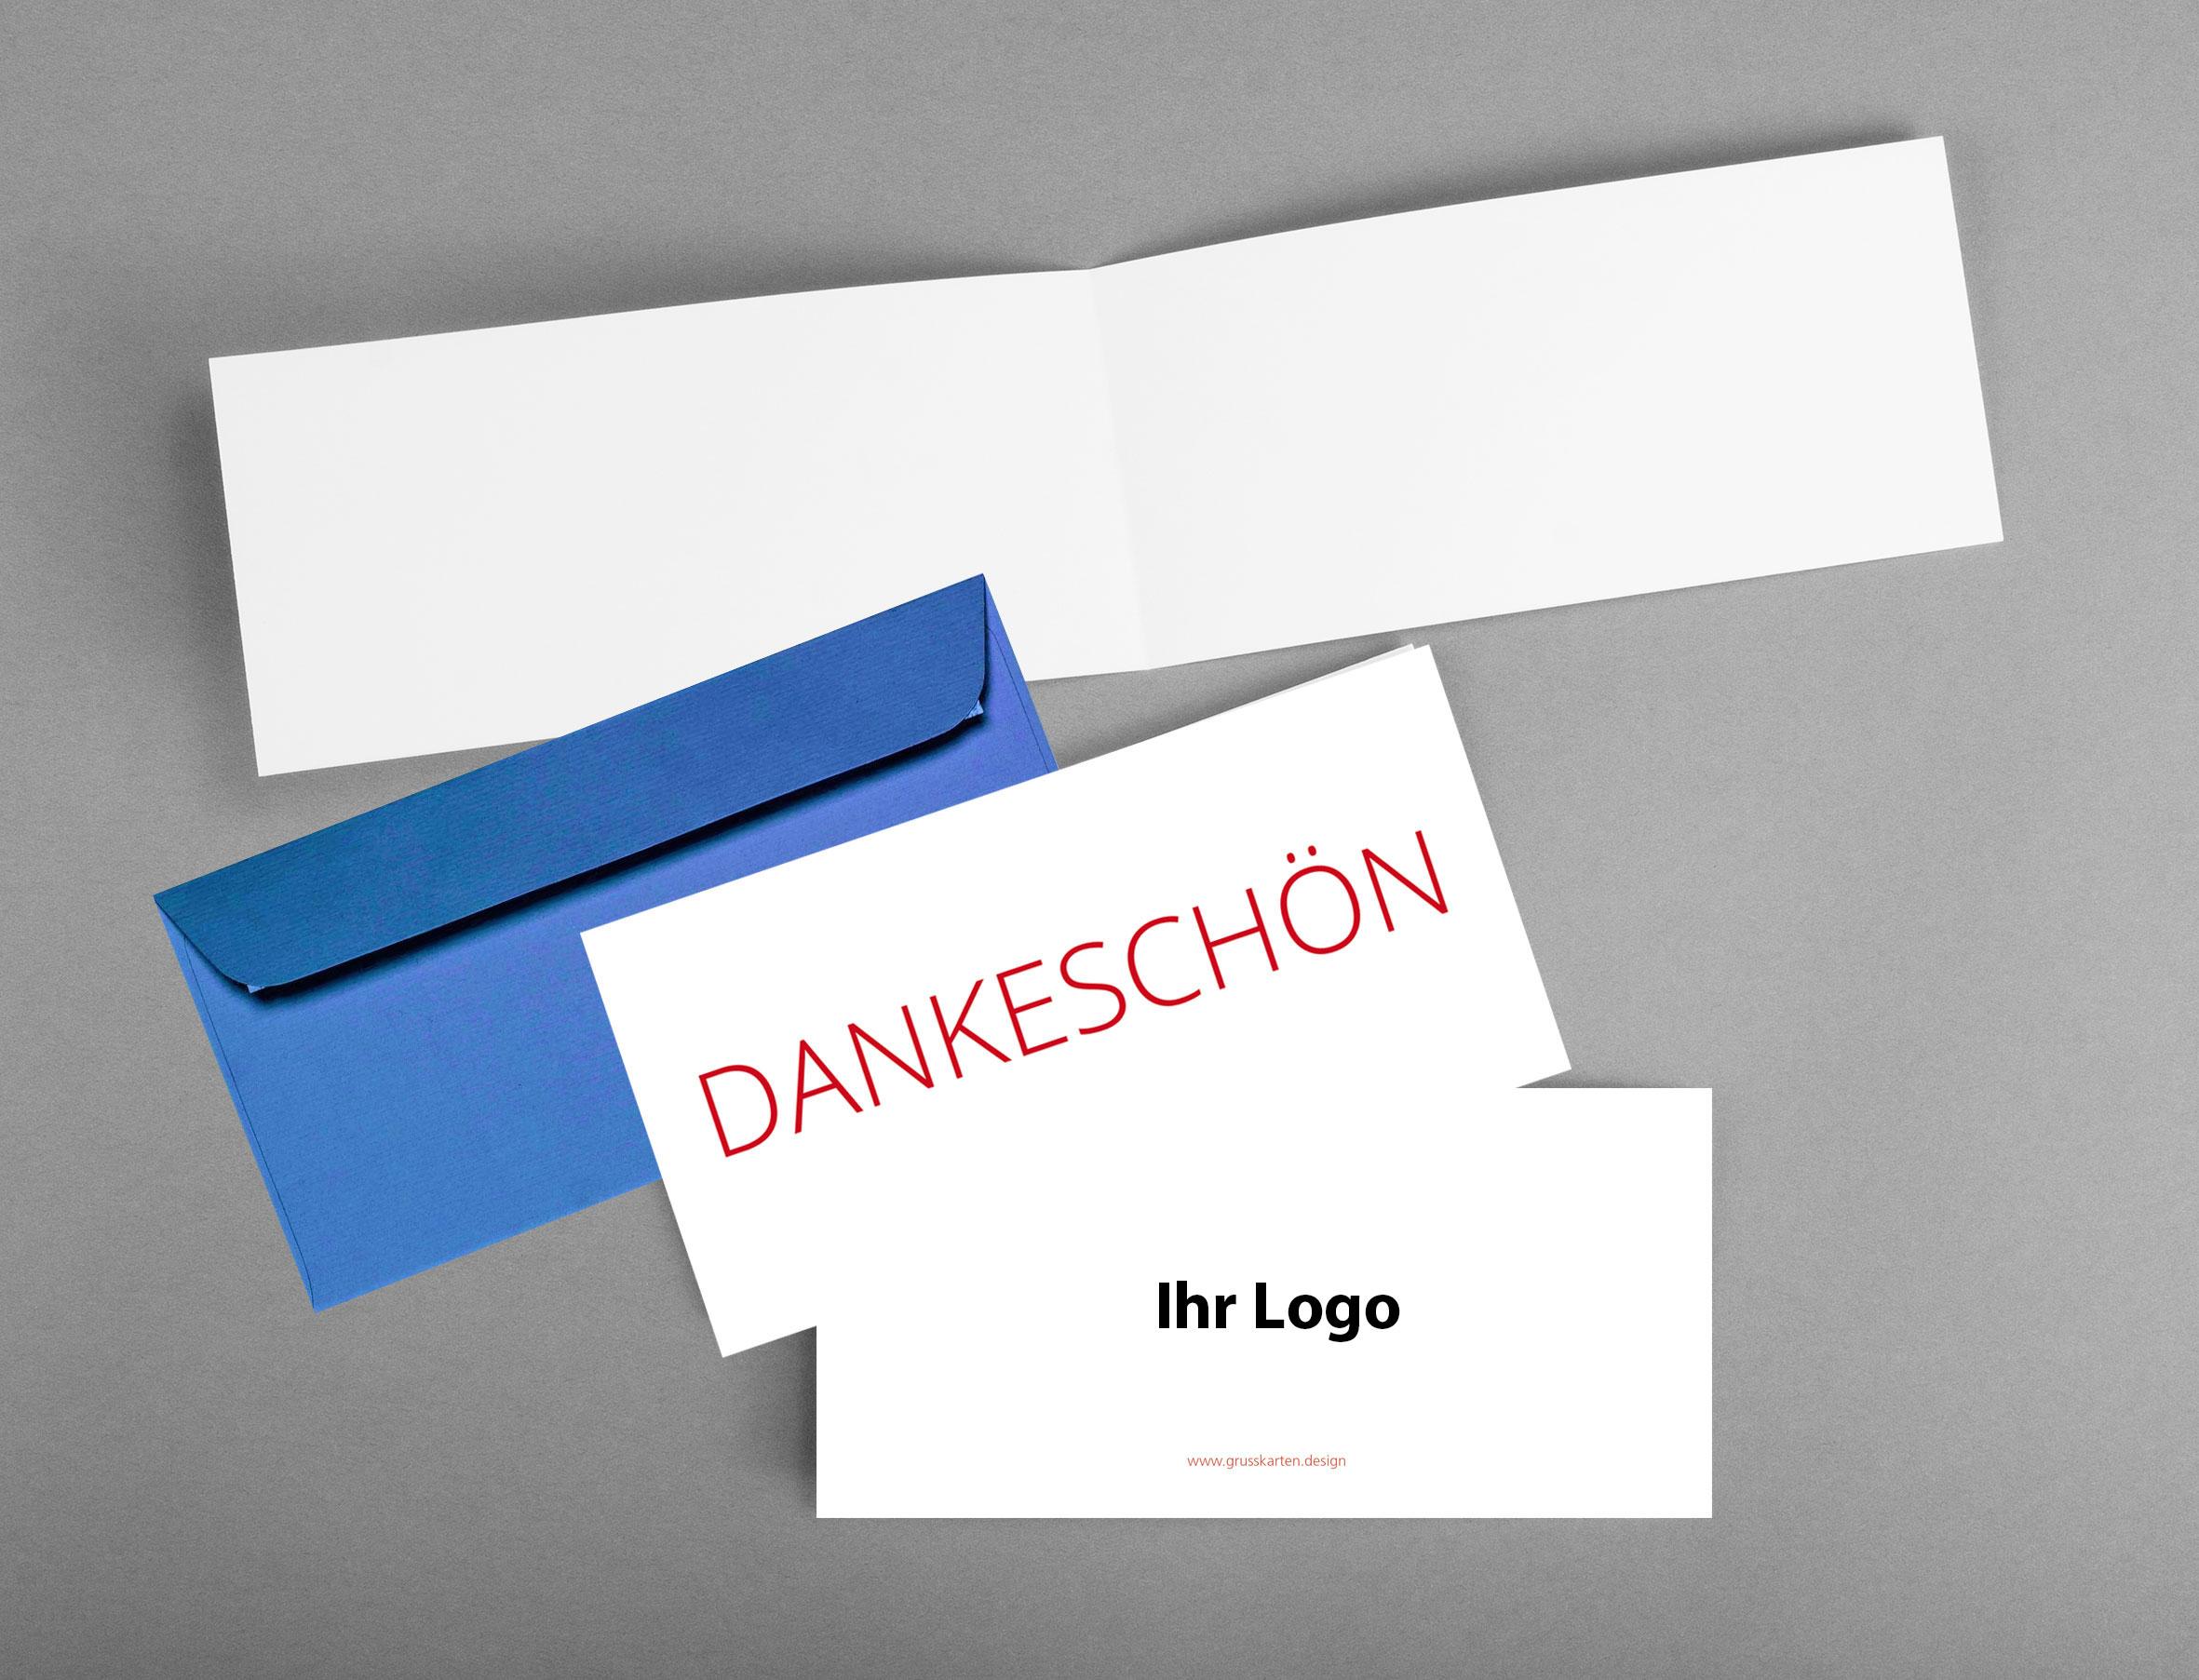 Firmengrusskarte-mit-Logo_Dankekarte_Dankschoen_weiss_grusskarten